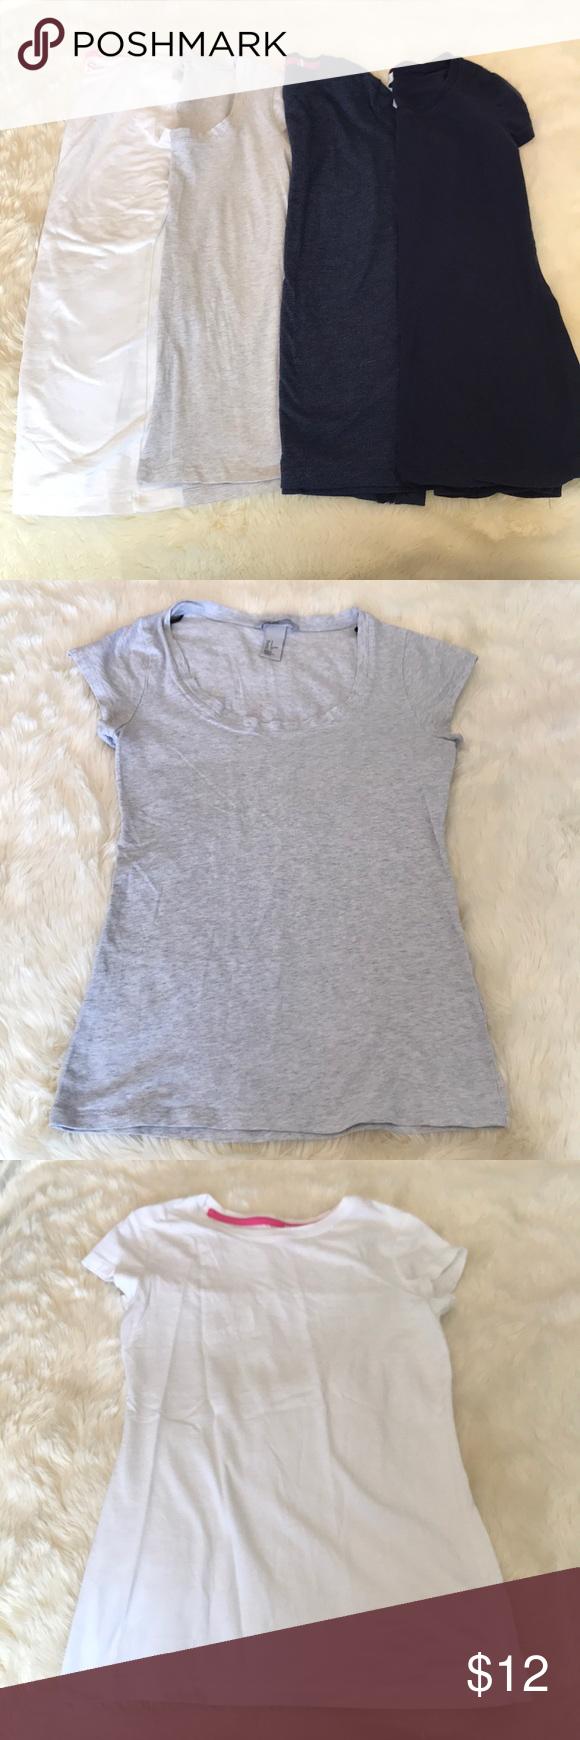 TShirt Bundle Ambiance apparel